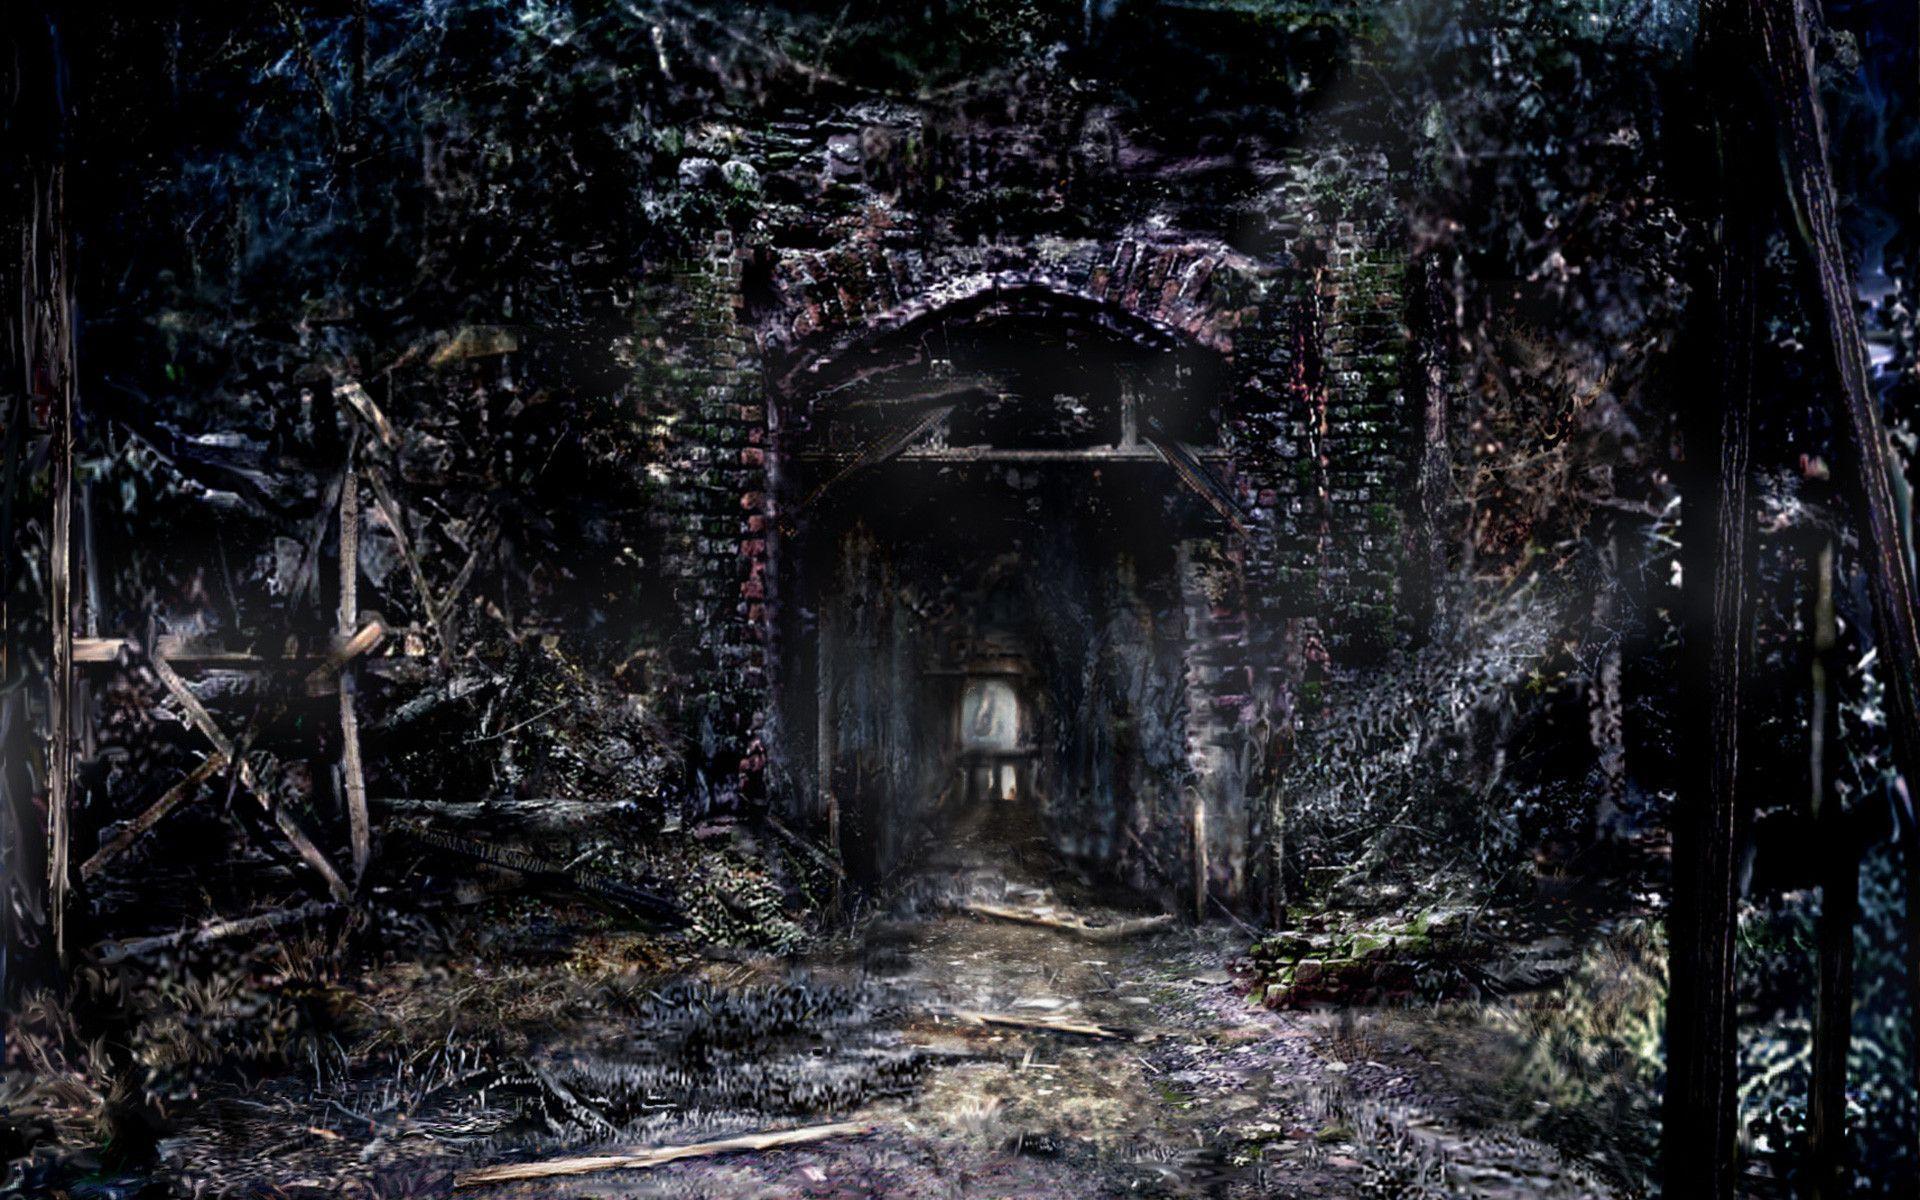 Resident Evil 4 Wallpapers - Wallpaper Cave